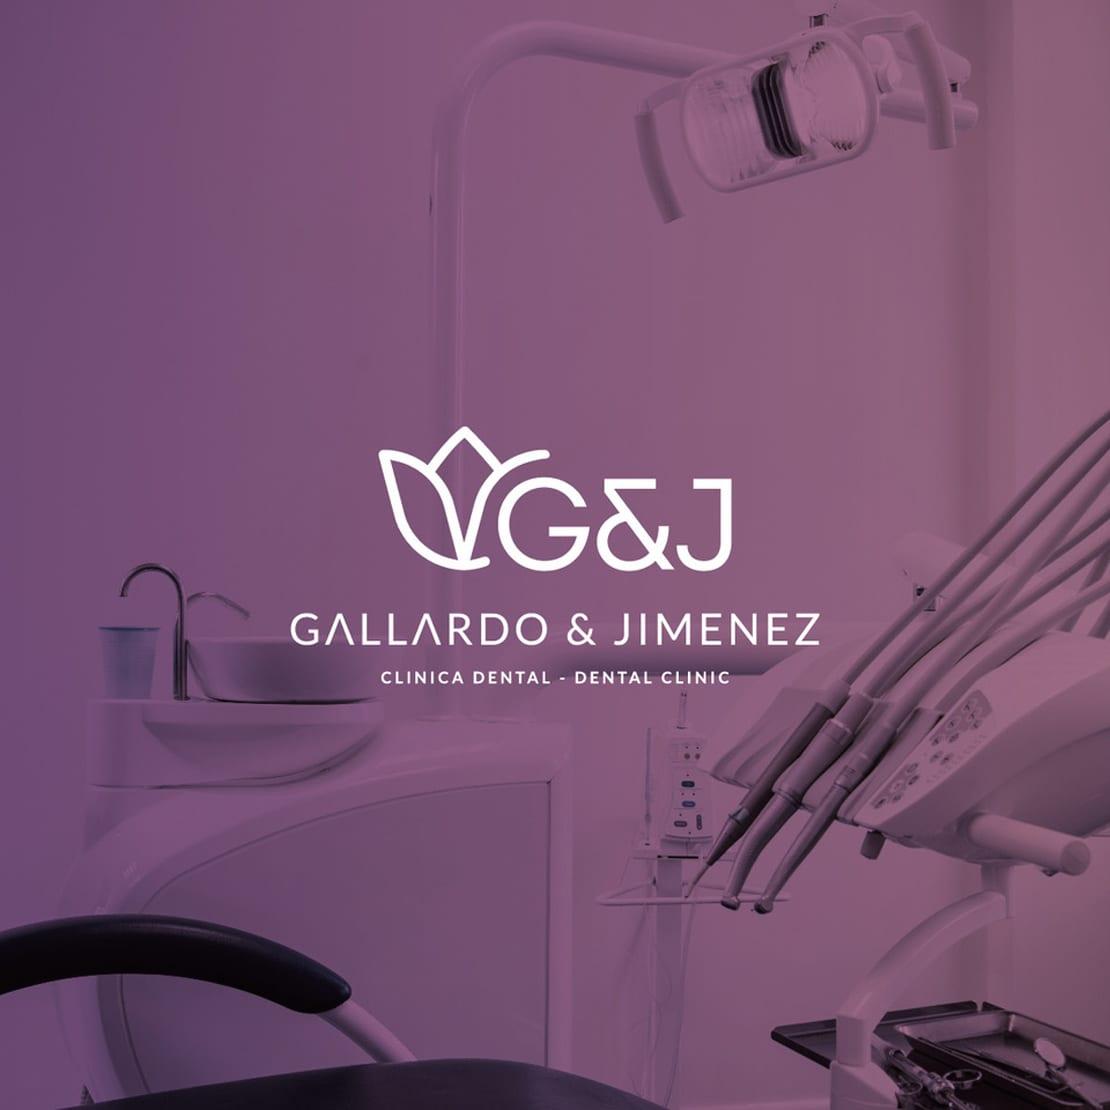 diseño de marca para clinica dental